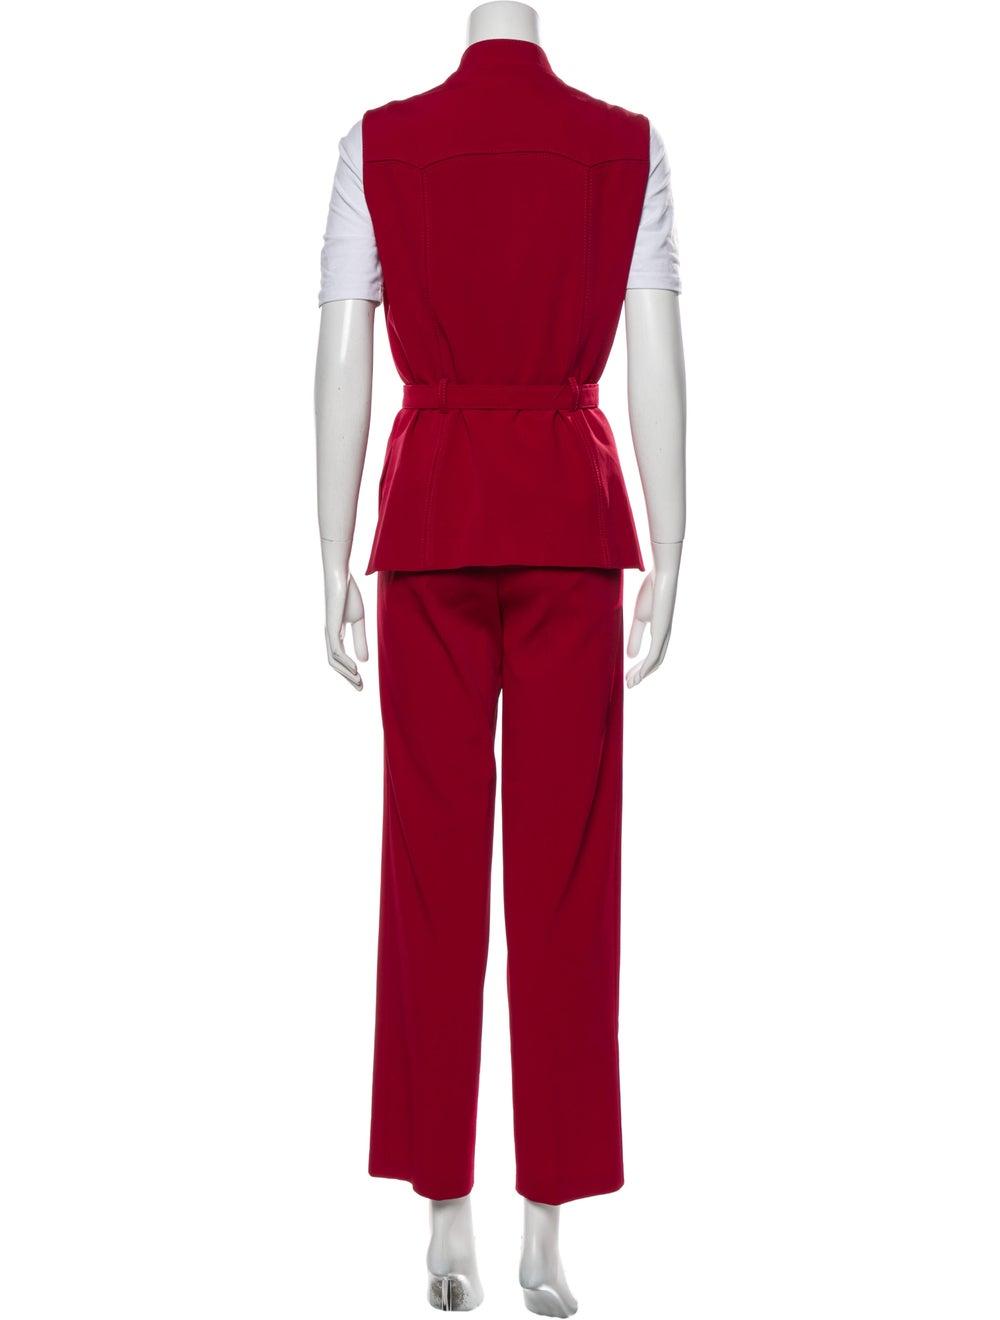 Prada Vintage 1990's Pant Set Red - image 3